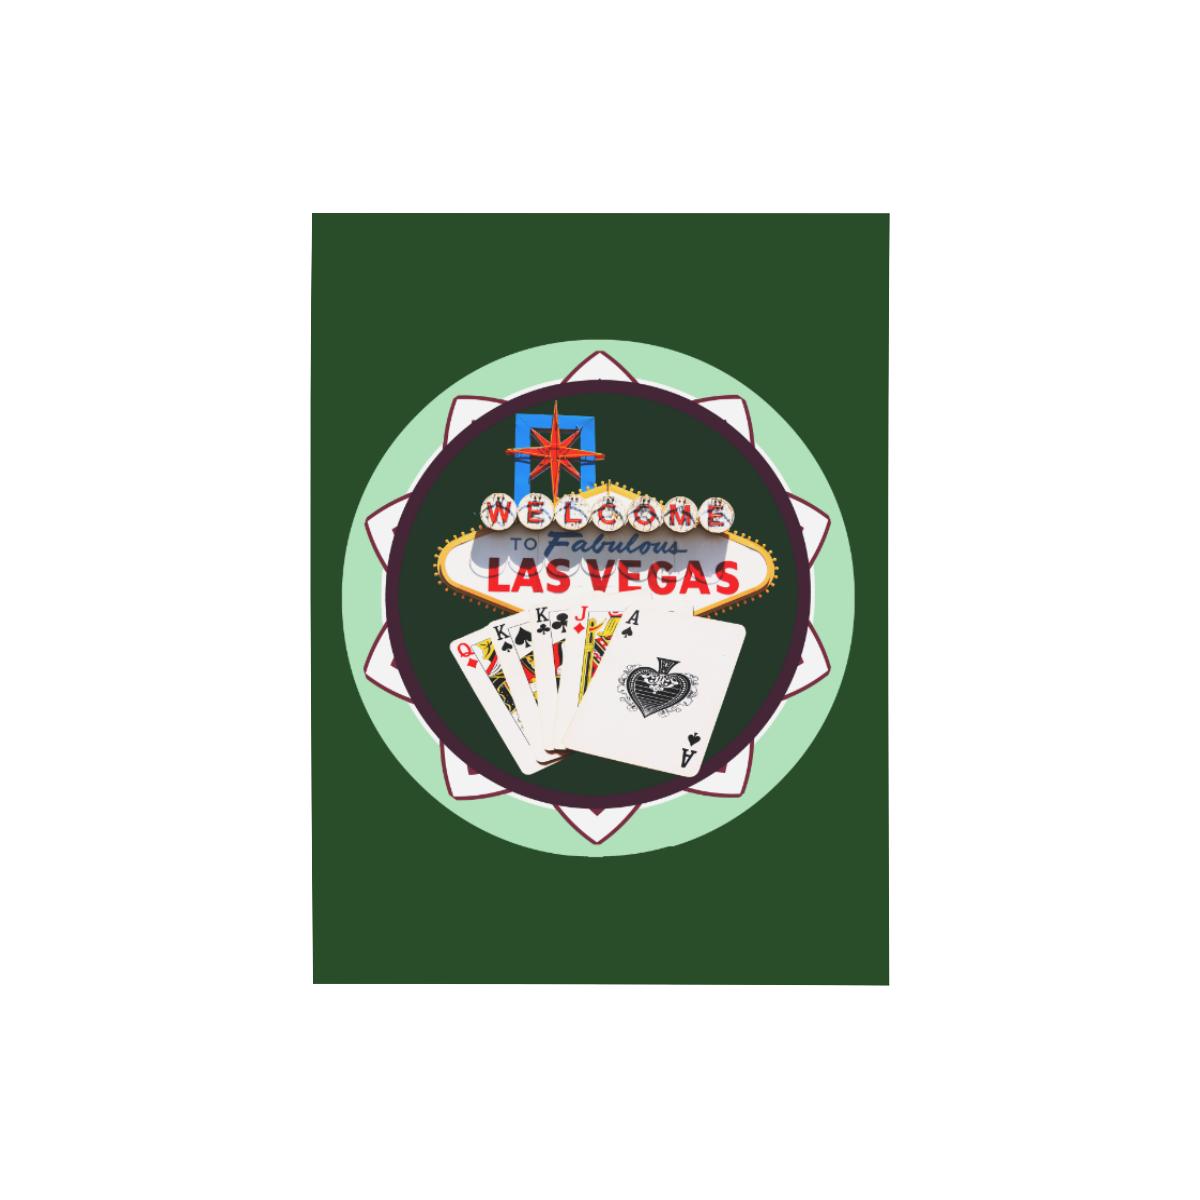 "LasVegasIcons Poker Chip - Poker Hand on Green Photo Panel for Tabletop Display 6""x8"""